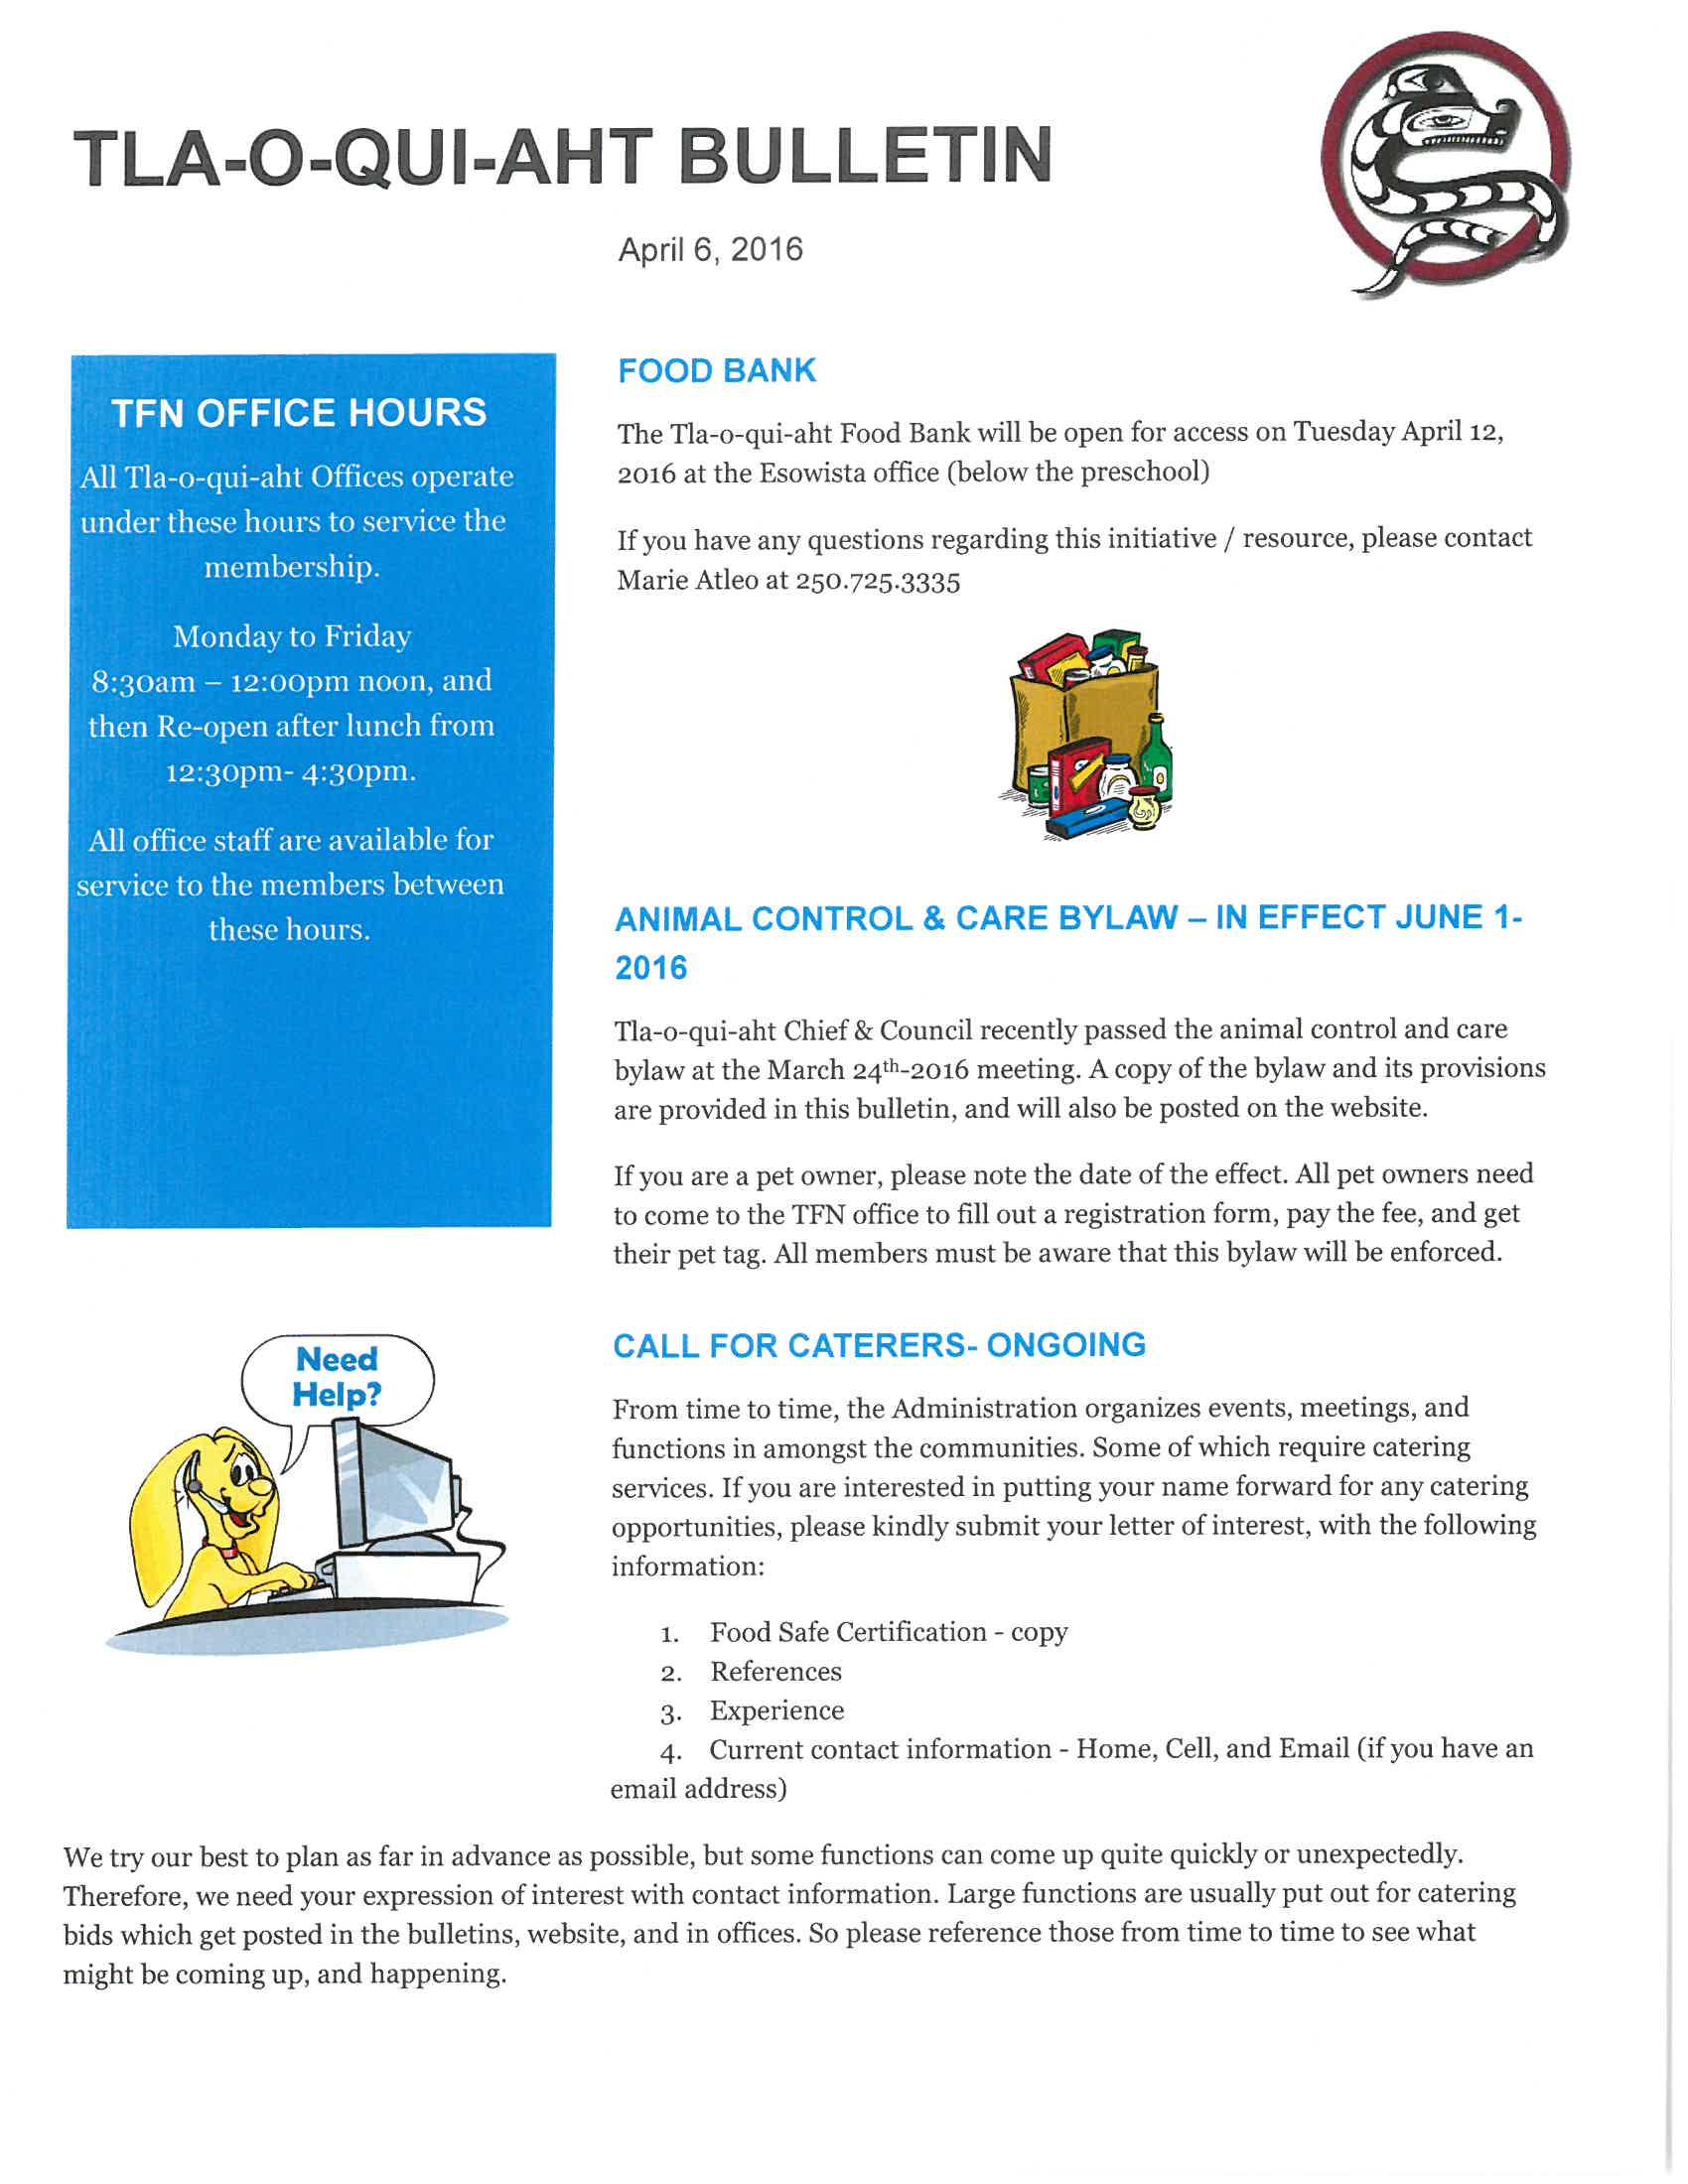 TFN Bulletin Apr 6-2016_Page_01.jpg